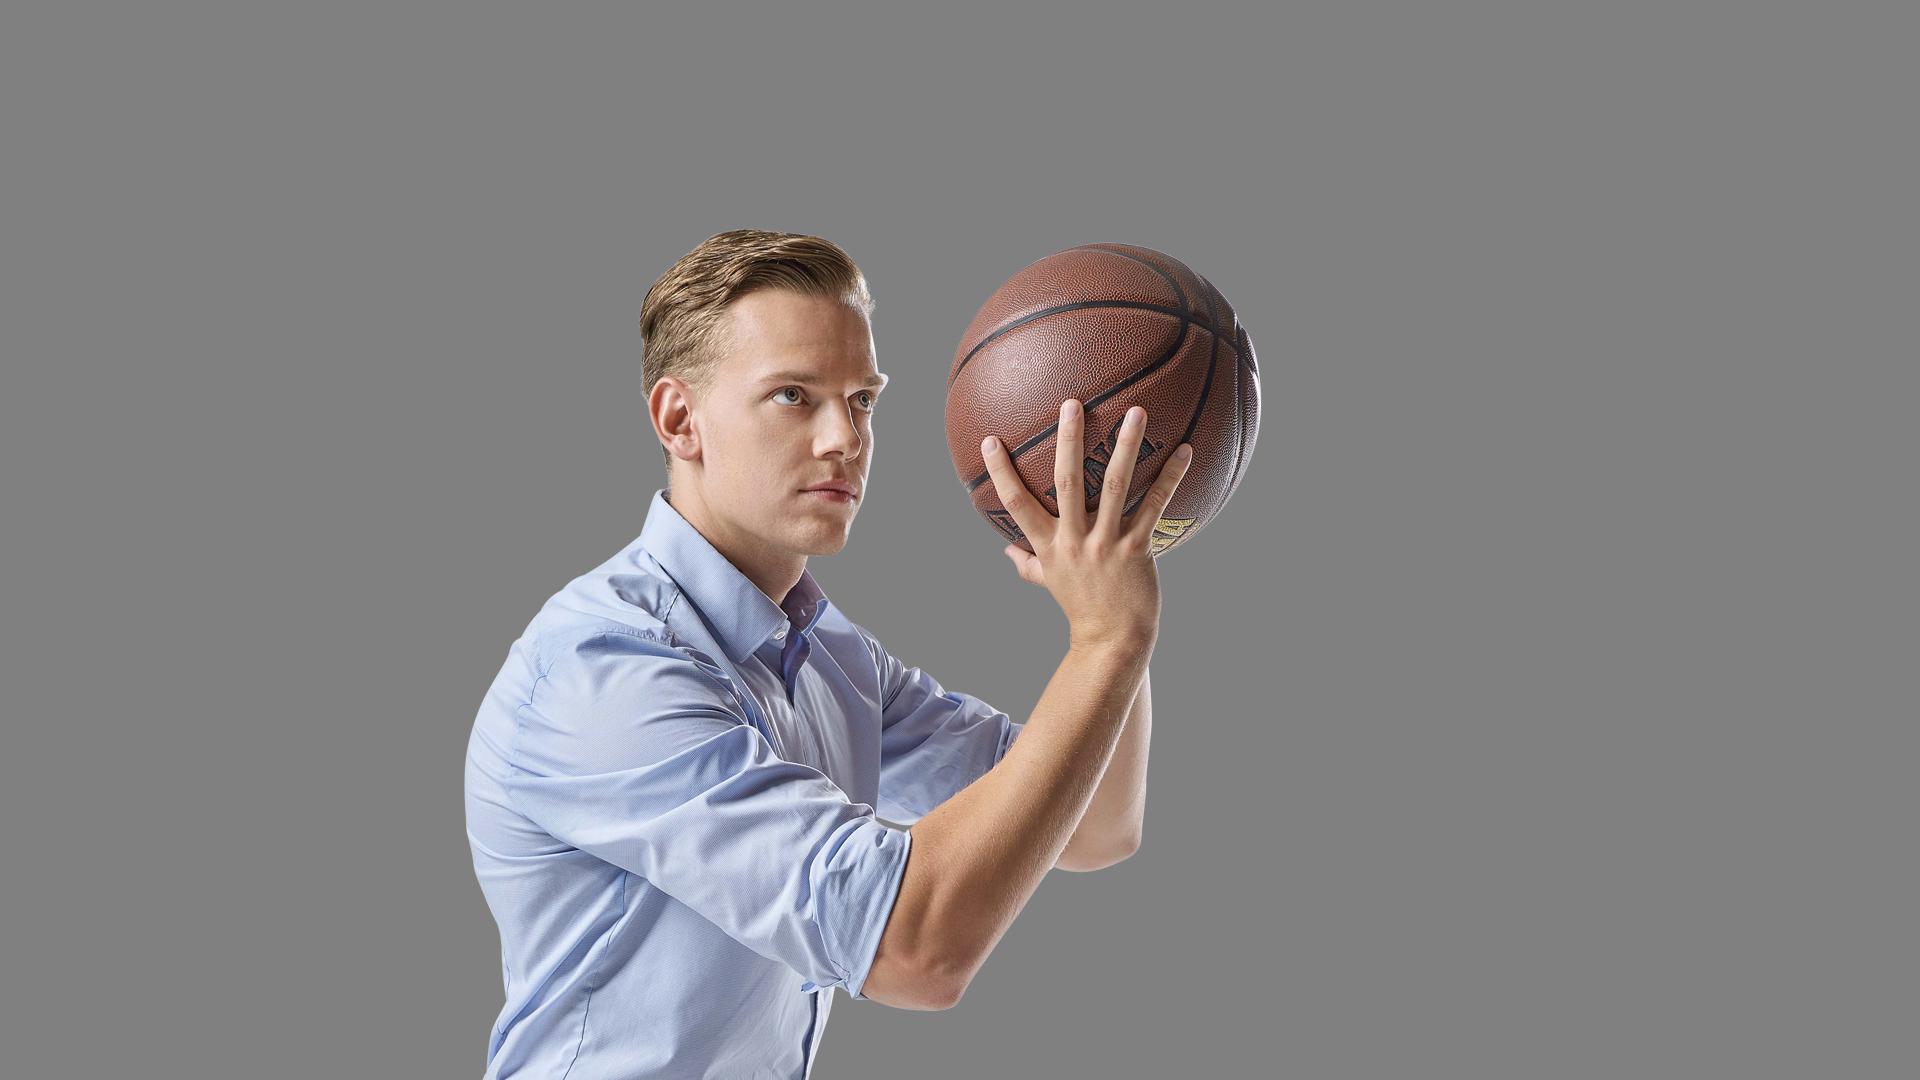 Employee Jan playing basketball